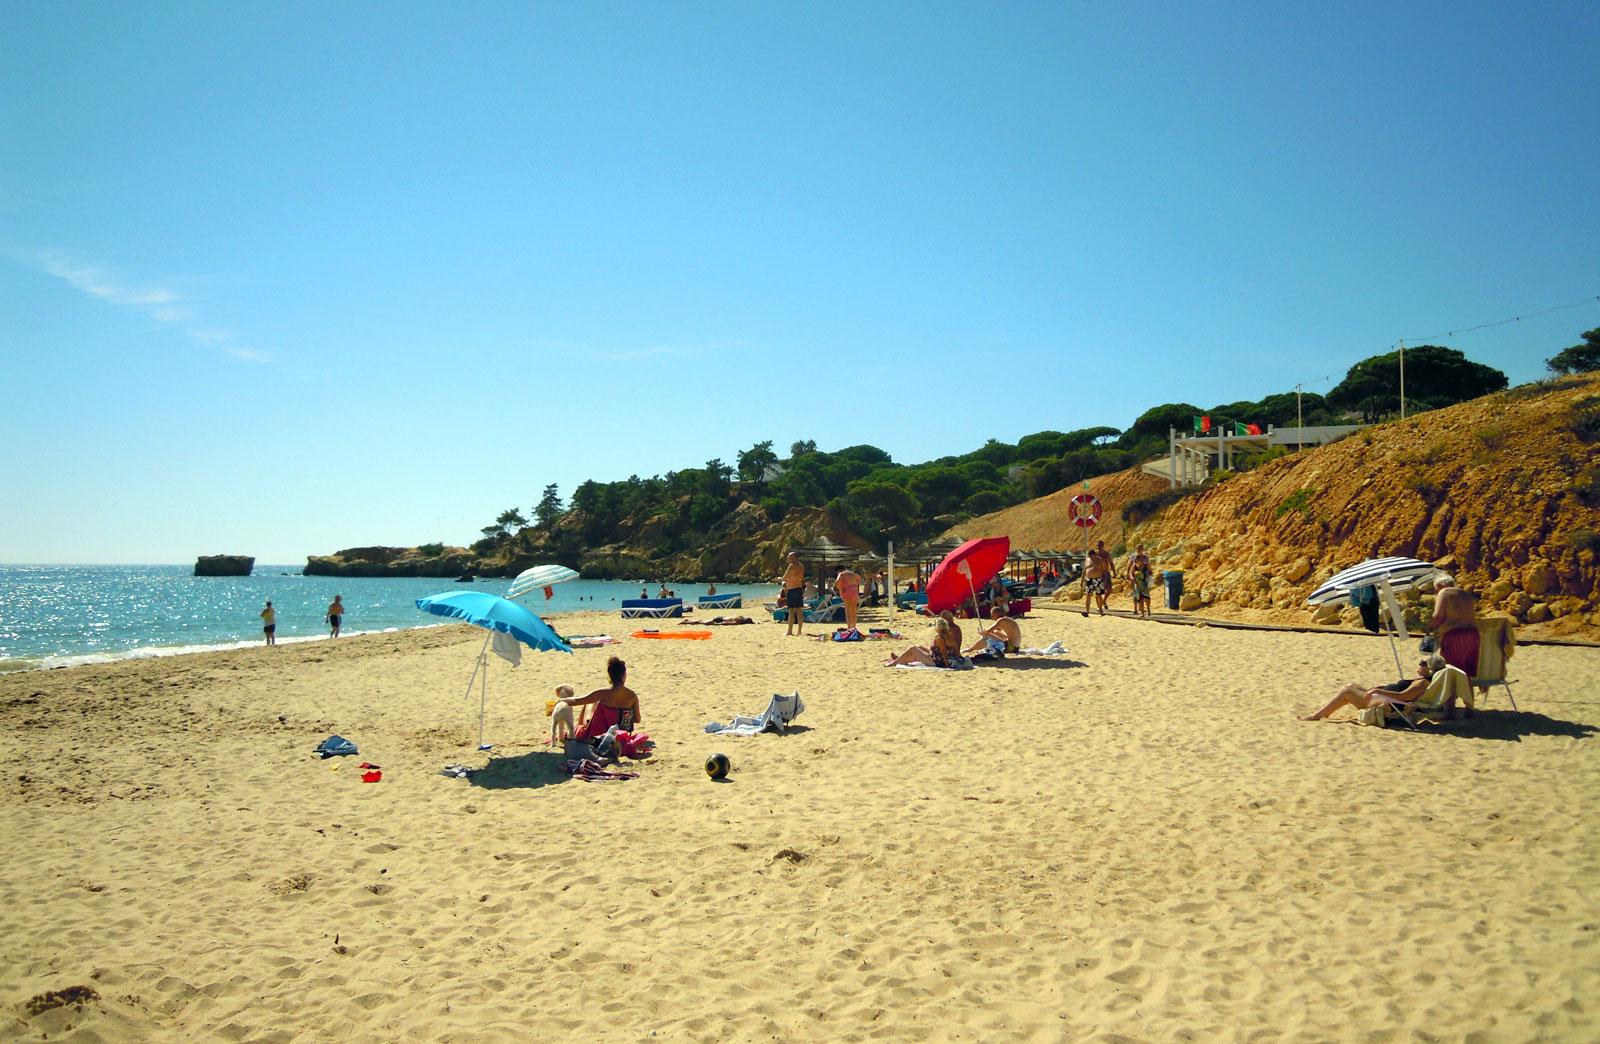 Praia De Santa Eulália Albufeira The Algarve Beaches Portugal Travel Guide